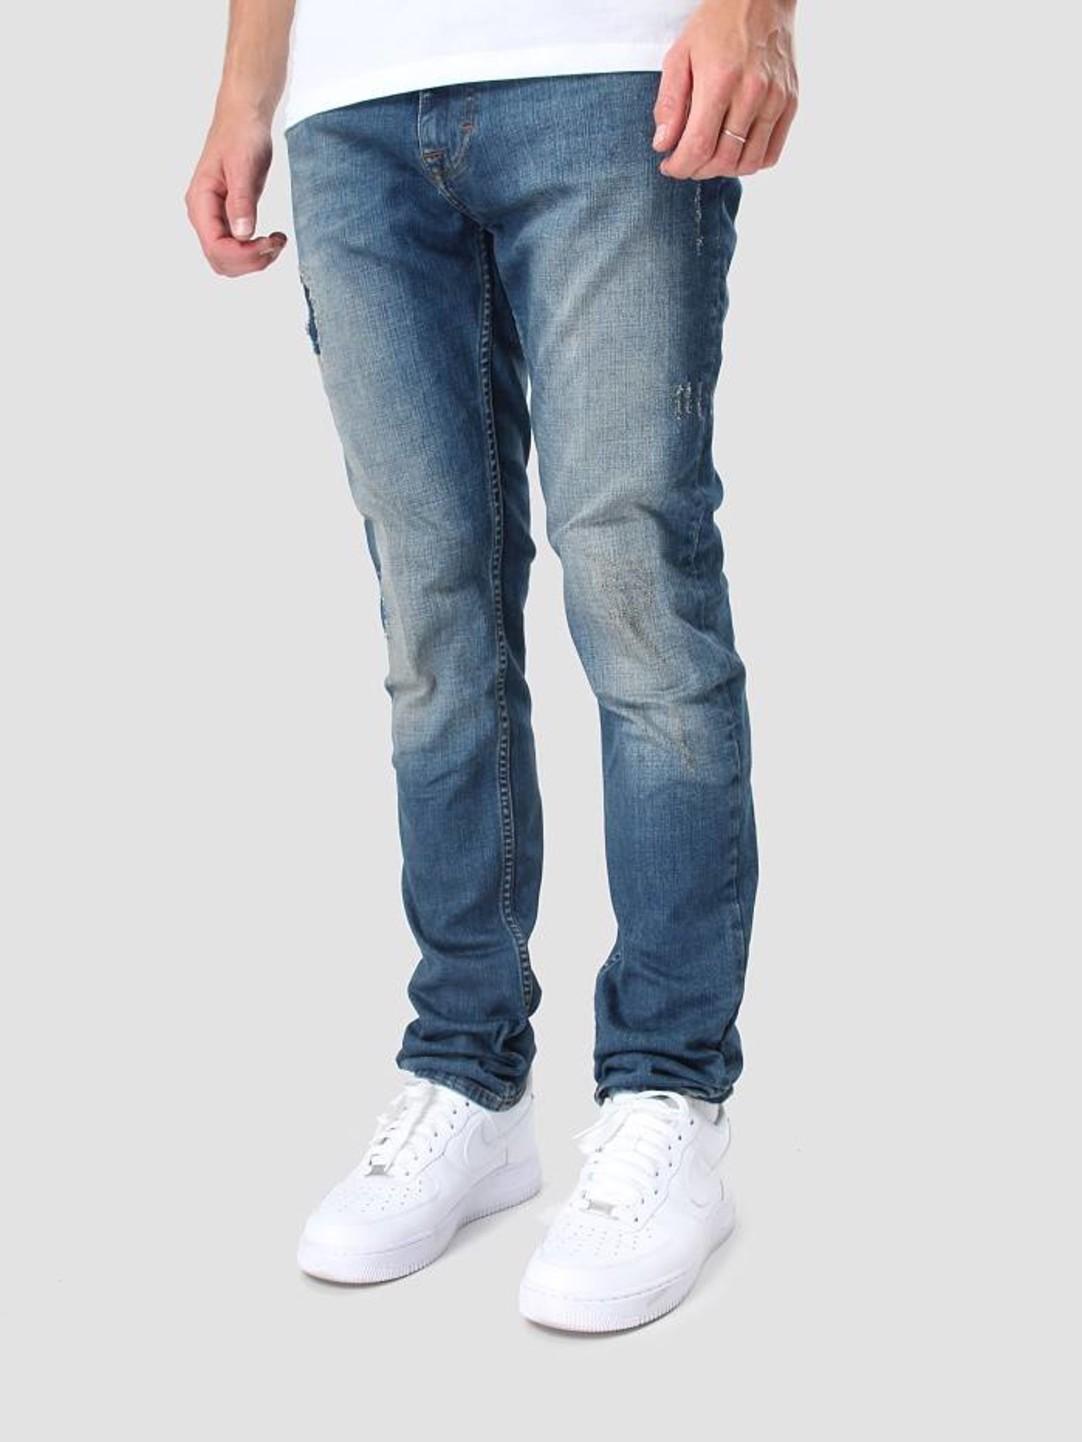 RVLT RVLT Destroy Denim Skinny Jeans 5005